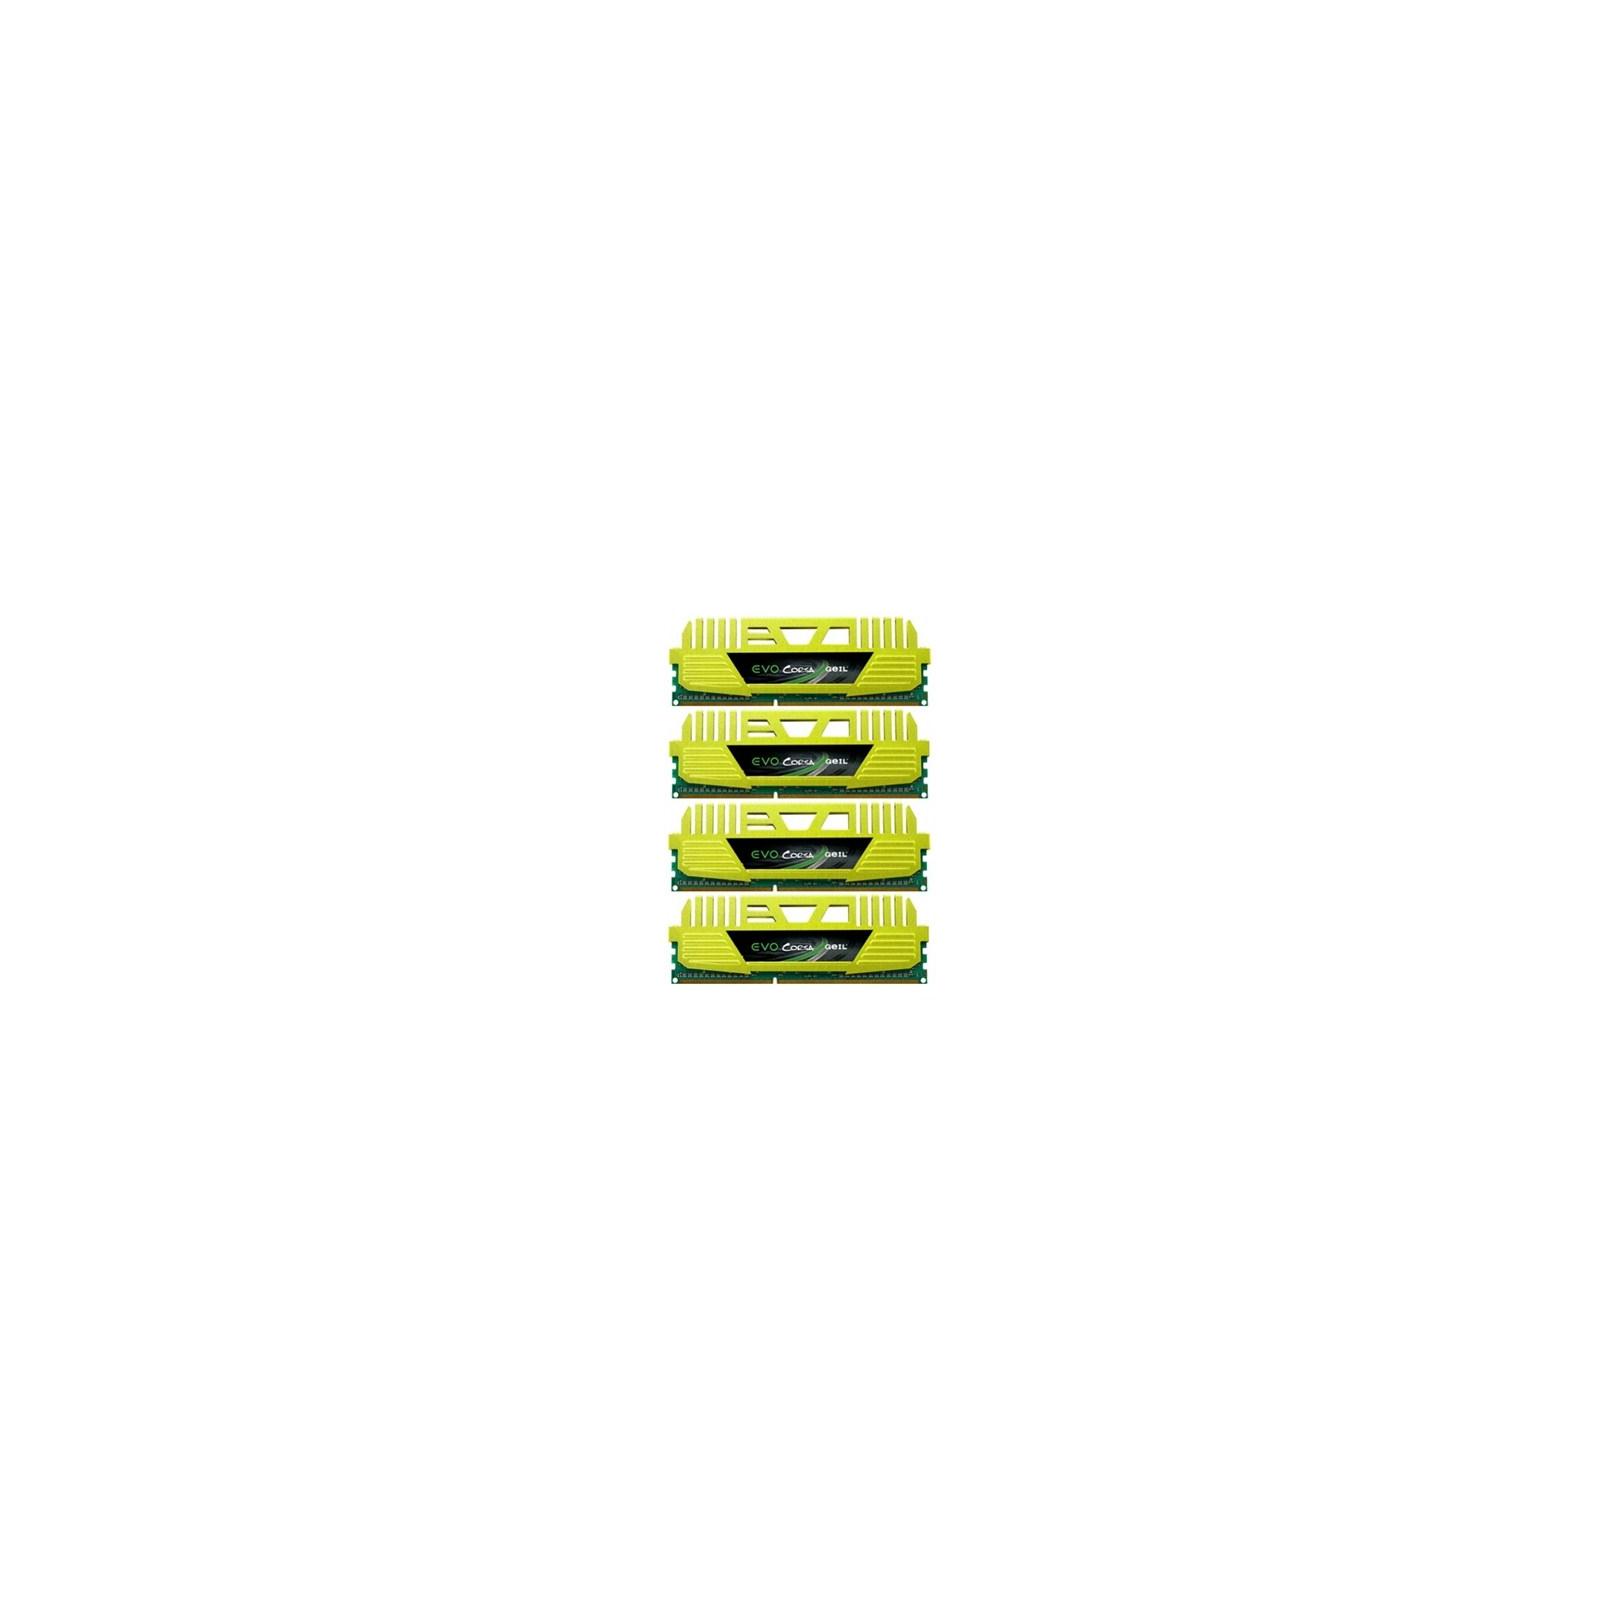 Модуль памяти для компьютера DDR3 32GB (4x8GB) 1600 MHz GEIL (GOC332GB1600C9QC)